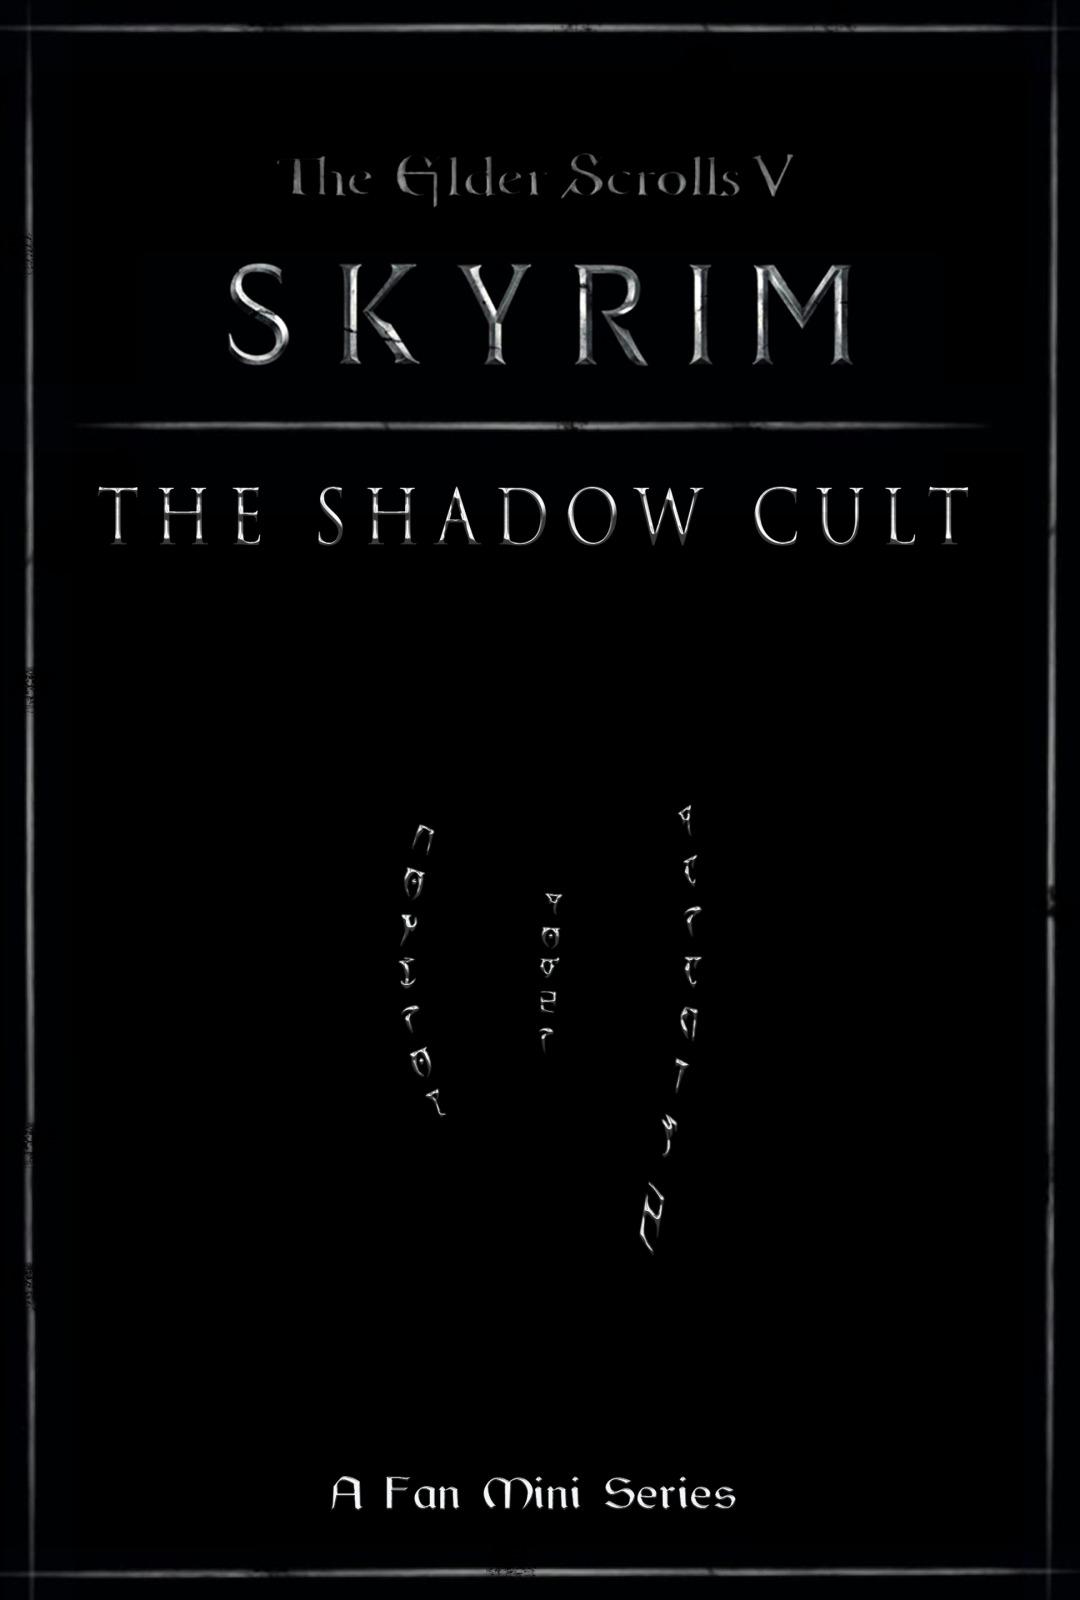 Skyrim the Shadow Cult